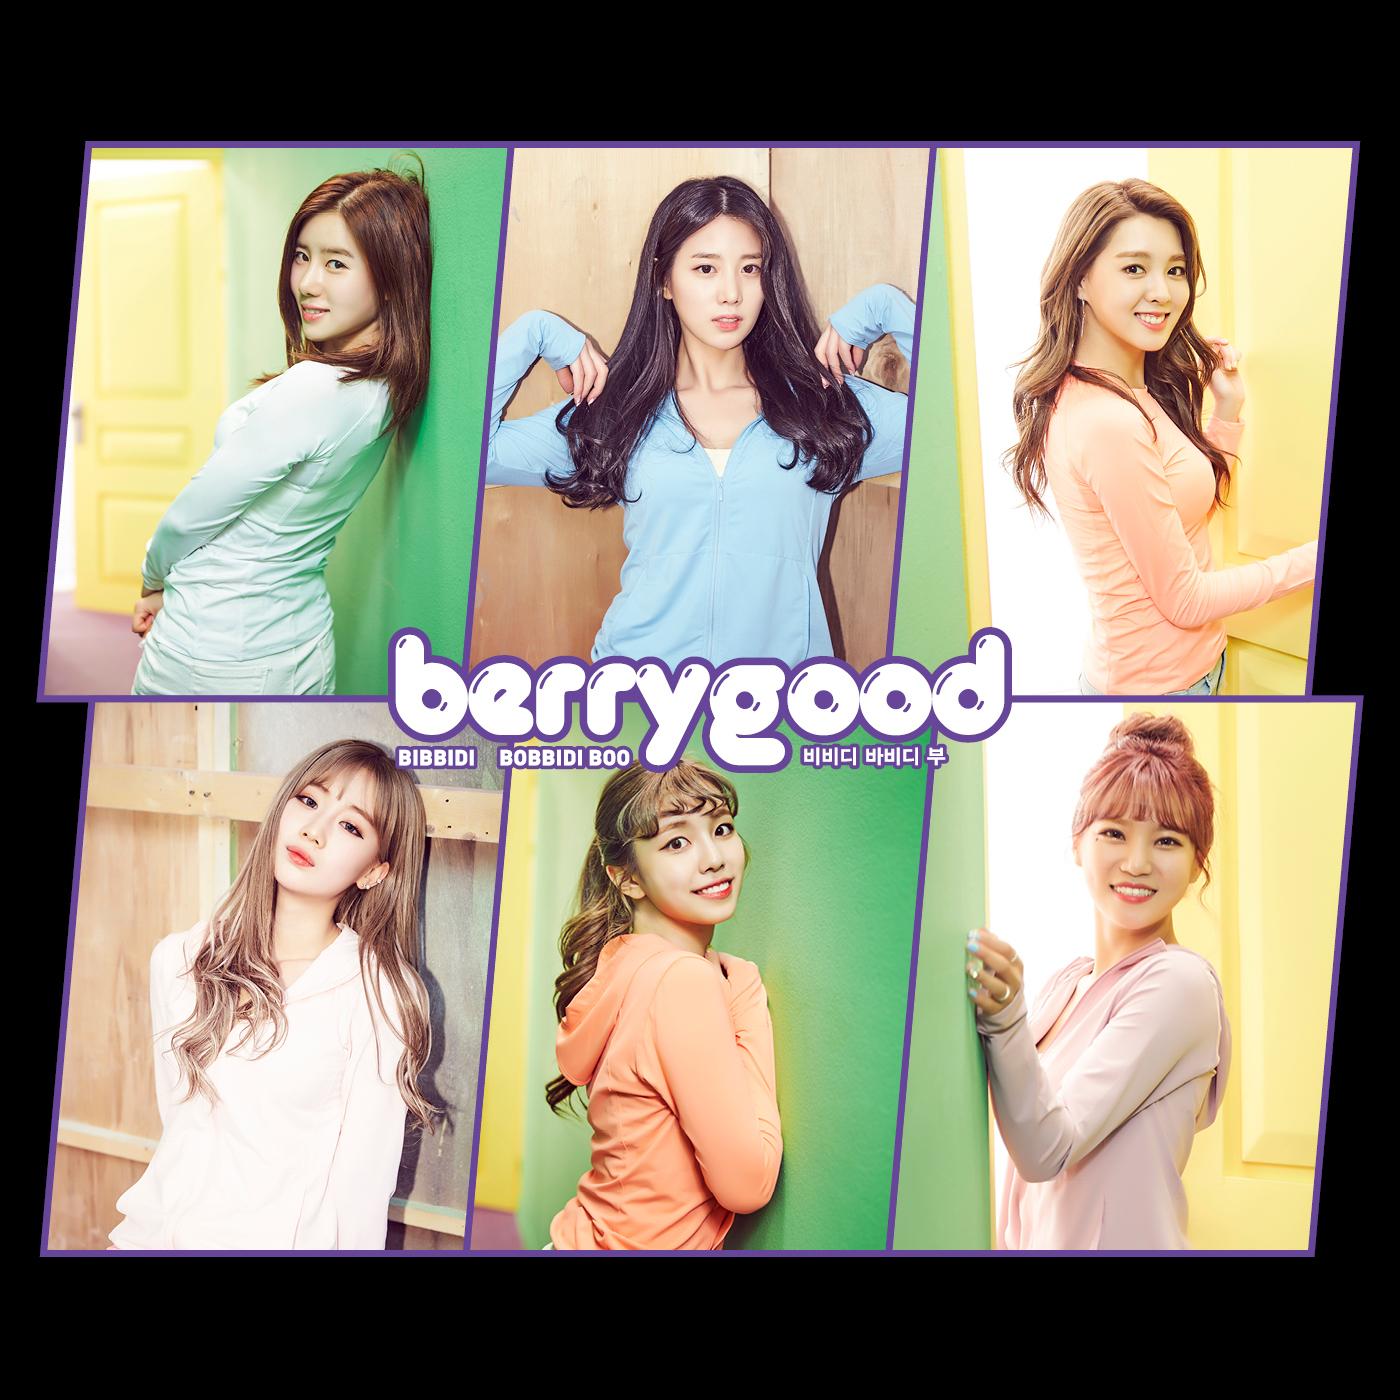 20170831.2208.08 Berry Good - BibbidiBobbidiBoo cover.jpg